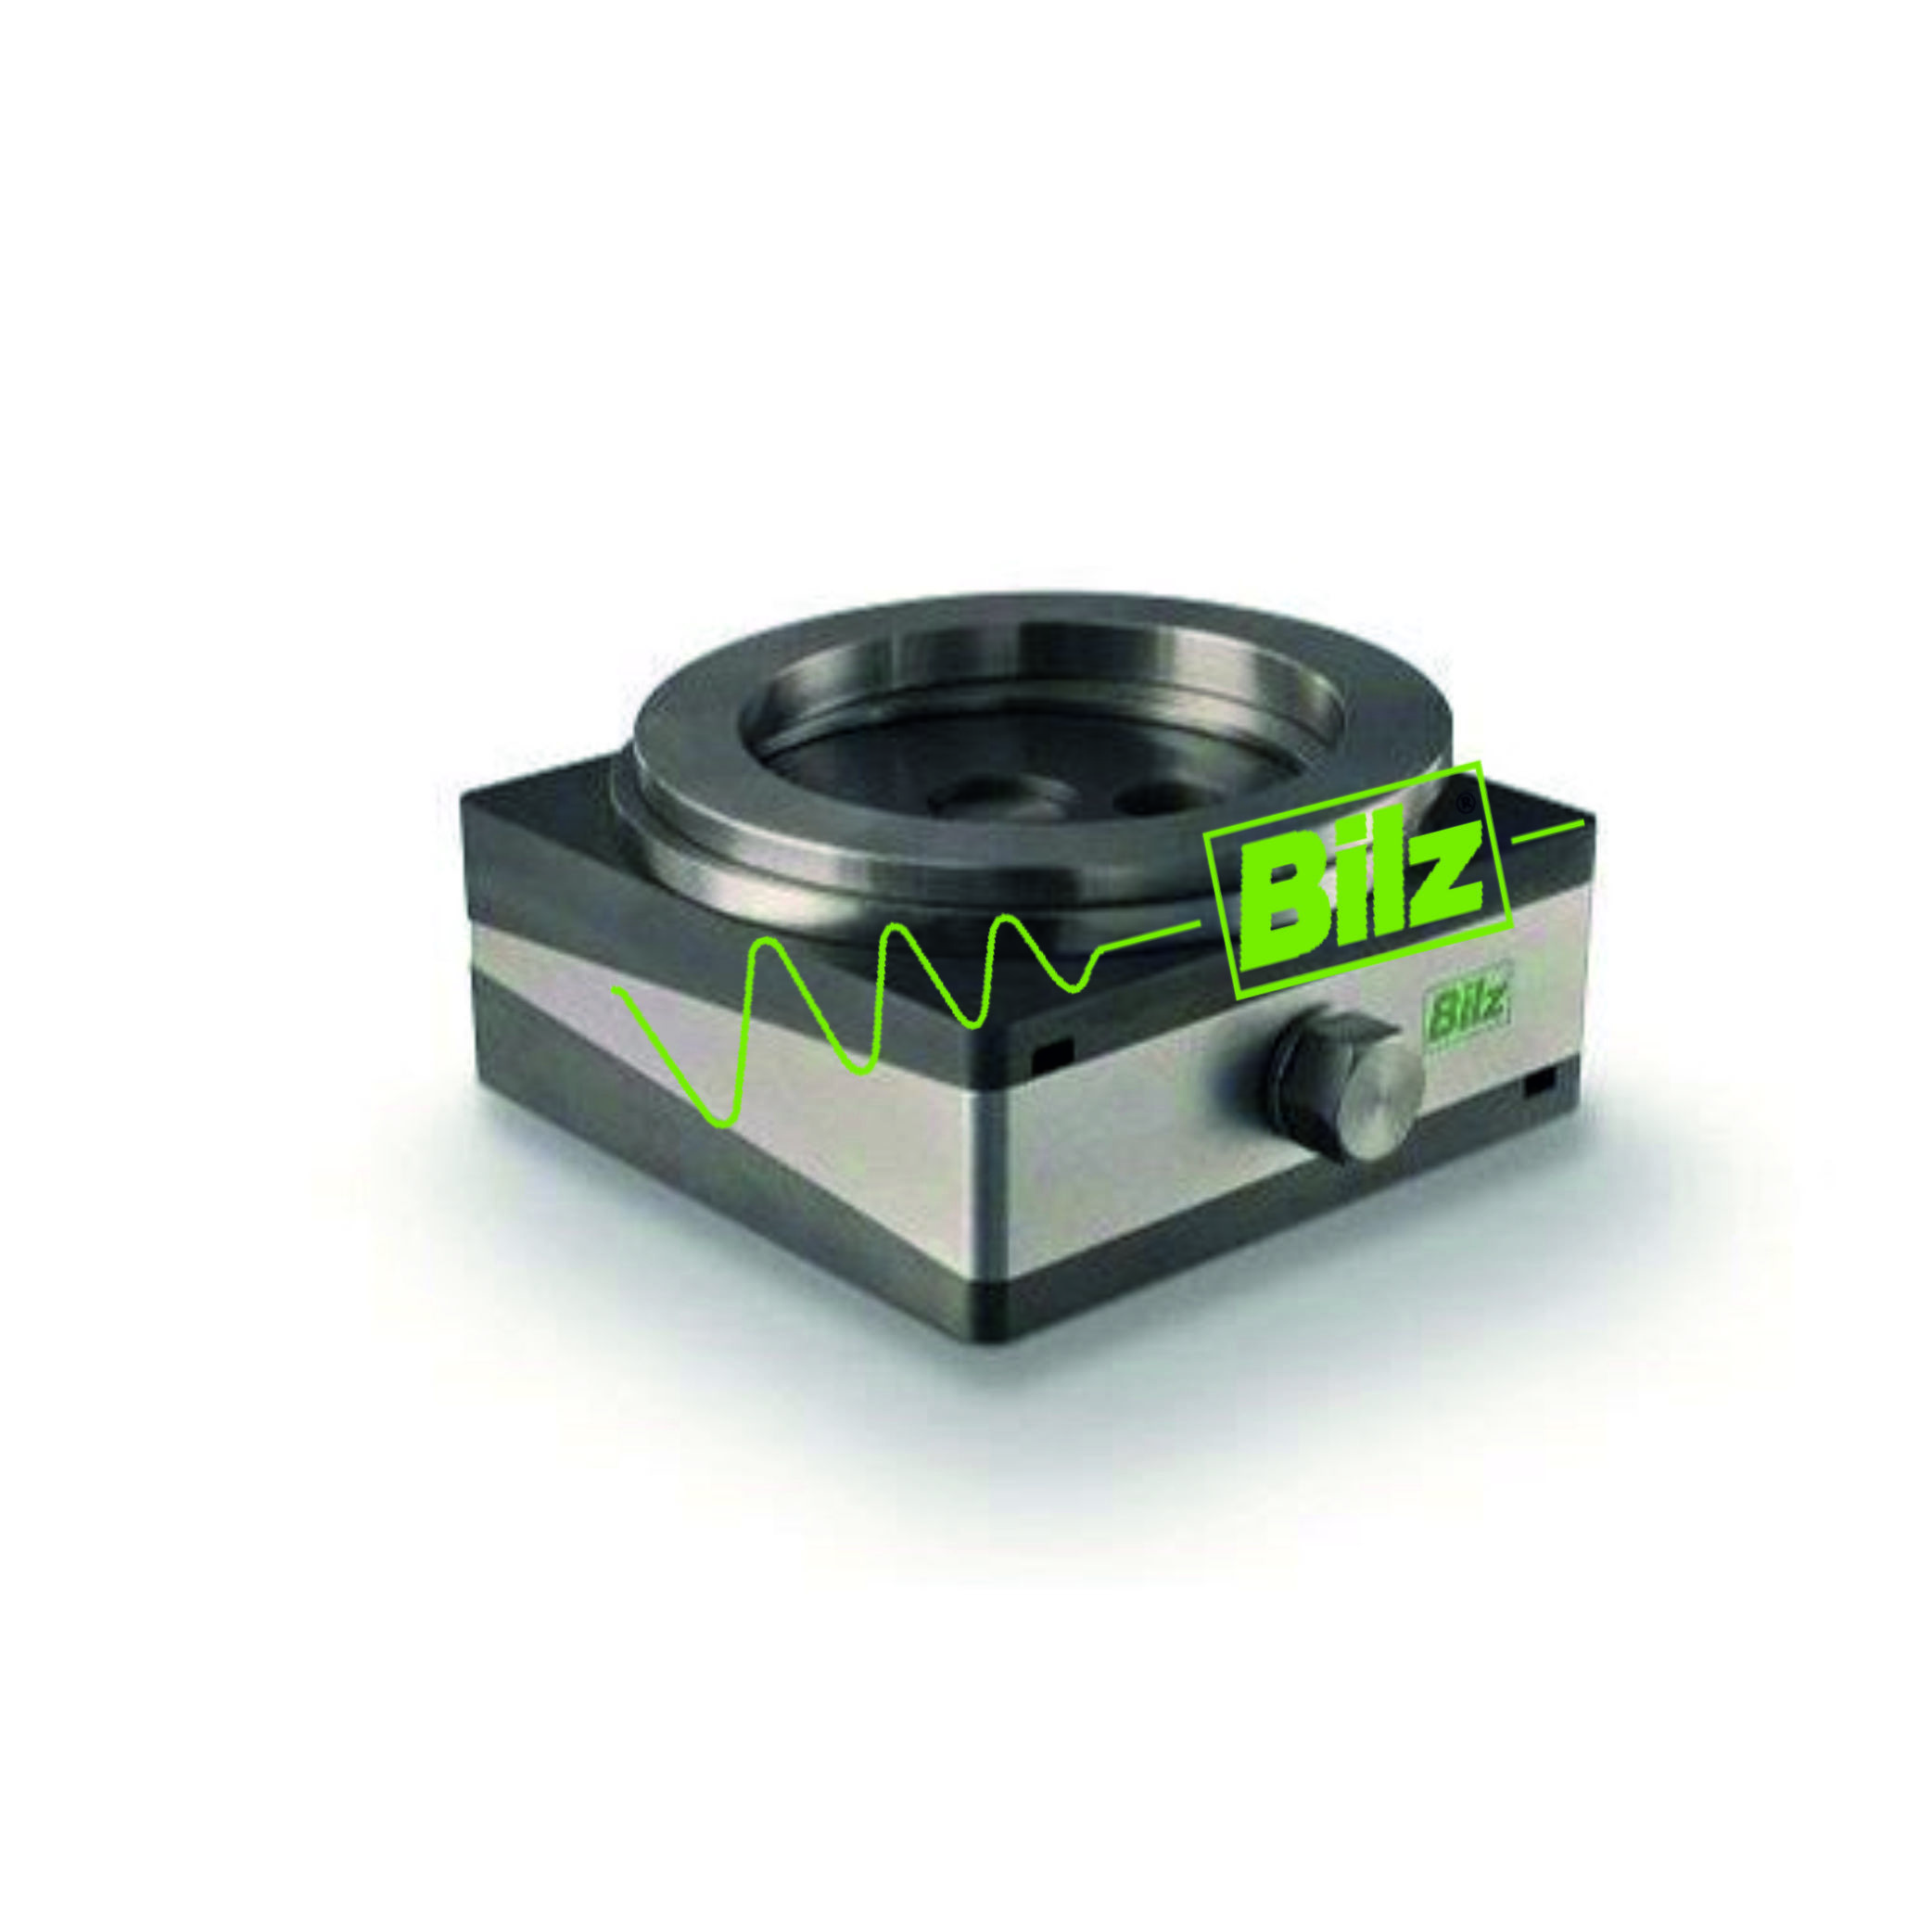 Bilz - Anti Vibration Wedge Mount